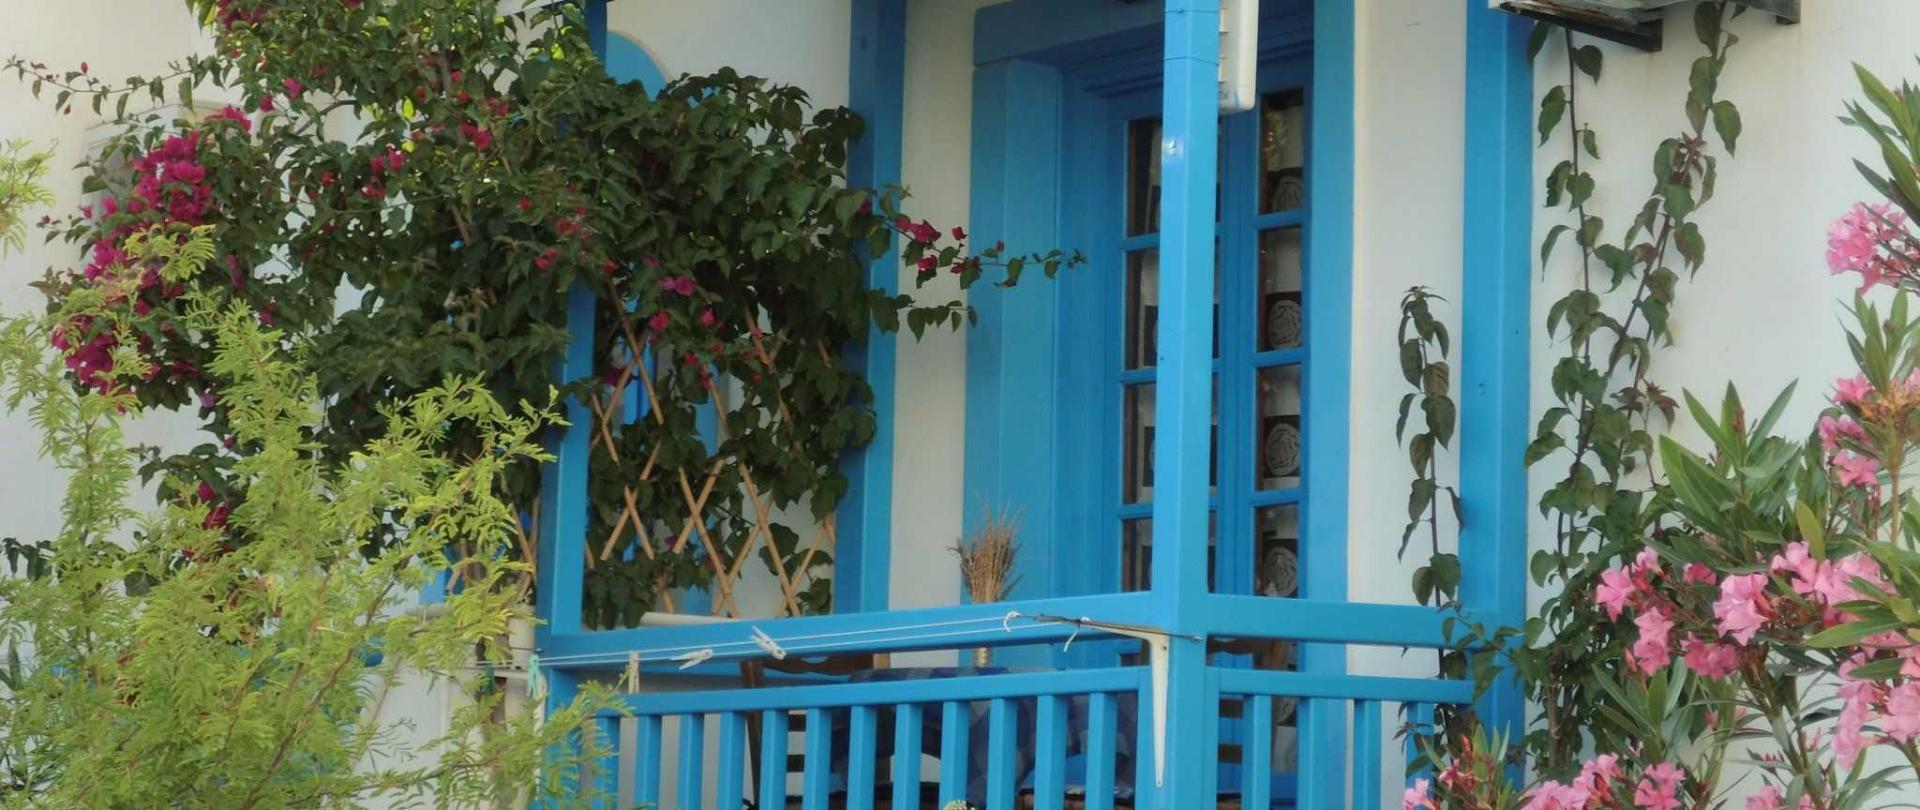 studios-matina-balcony-view-3.JPG